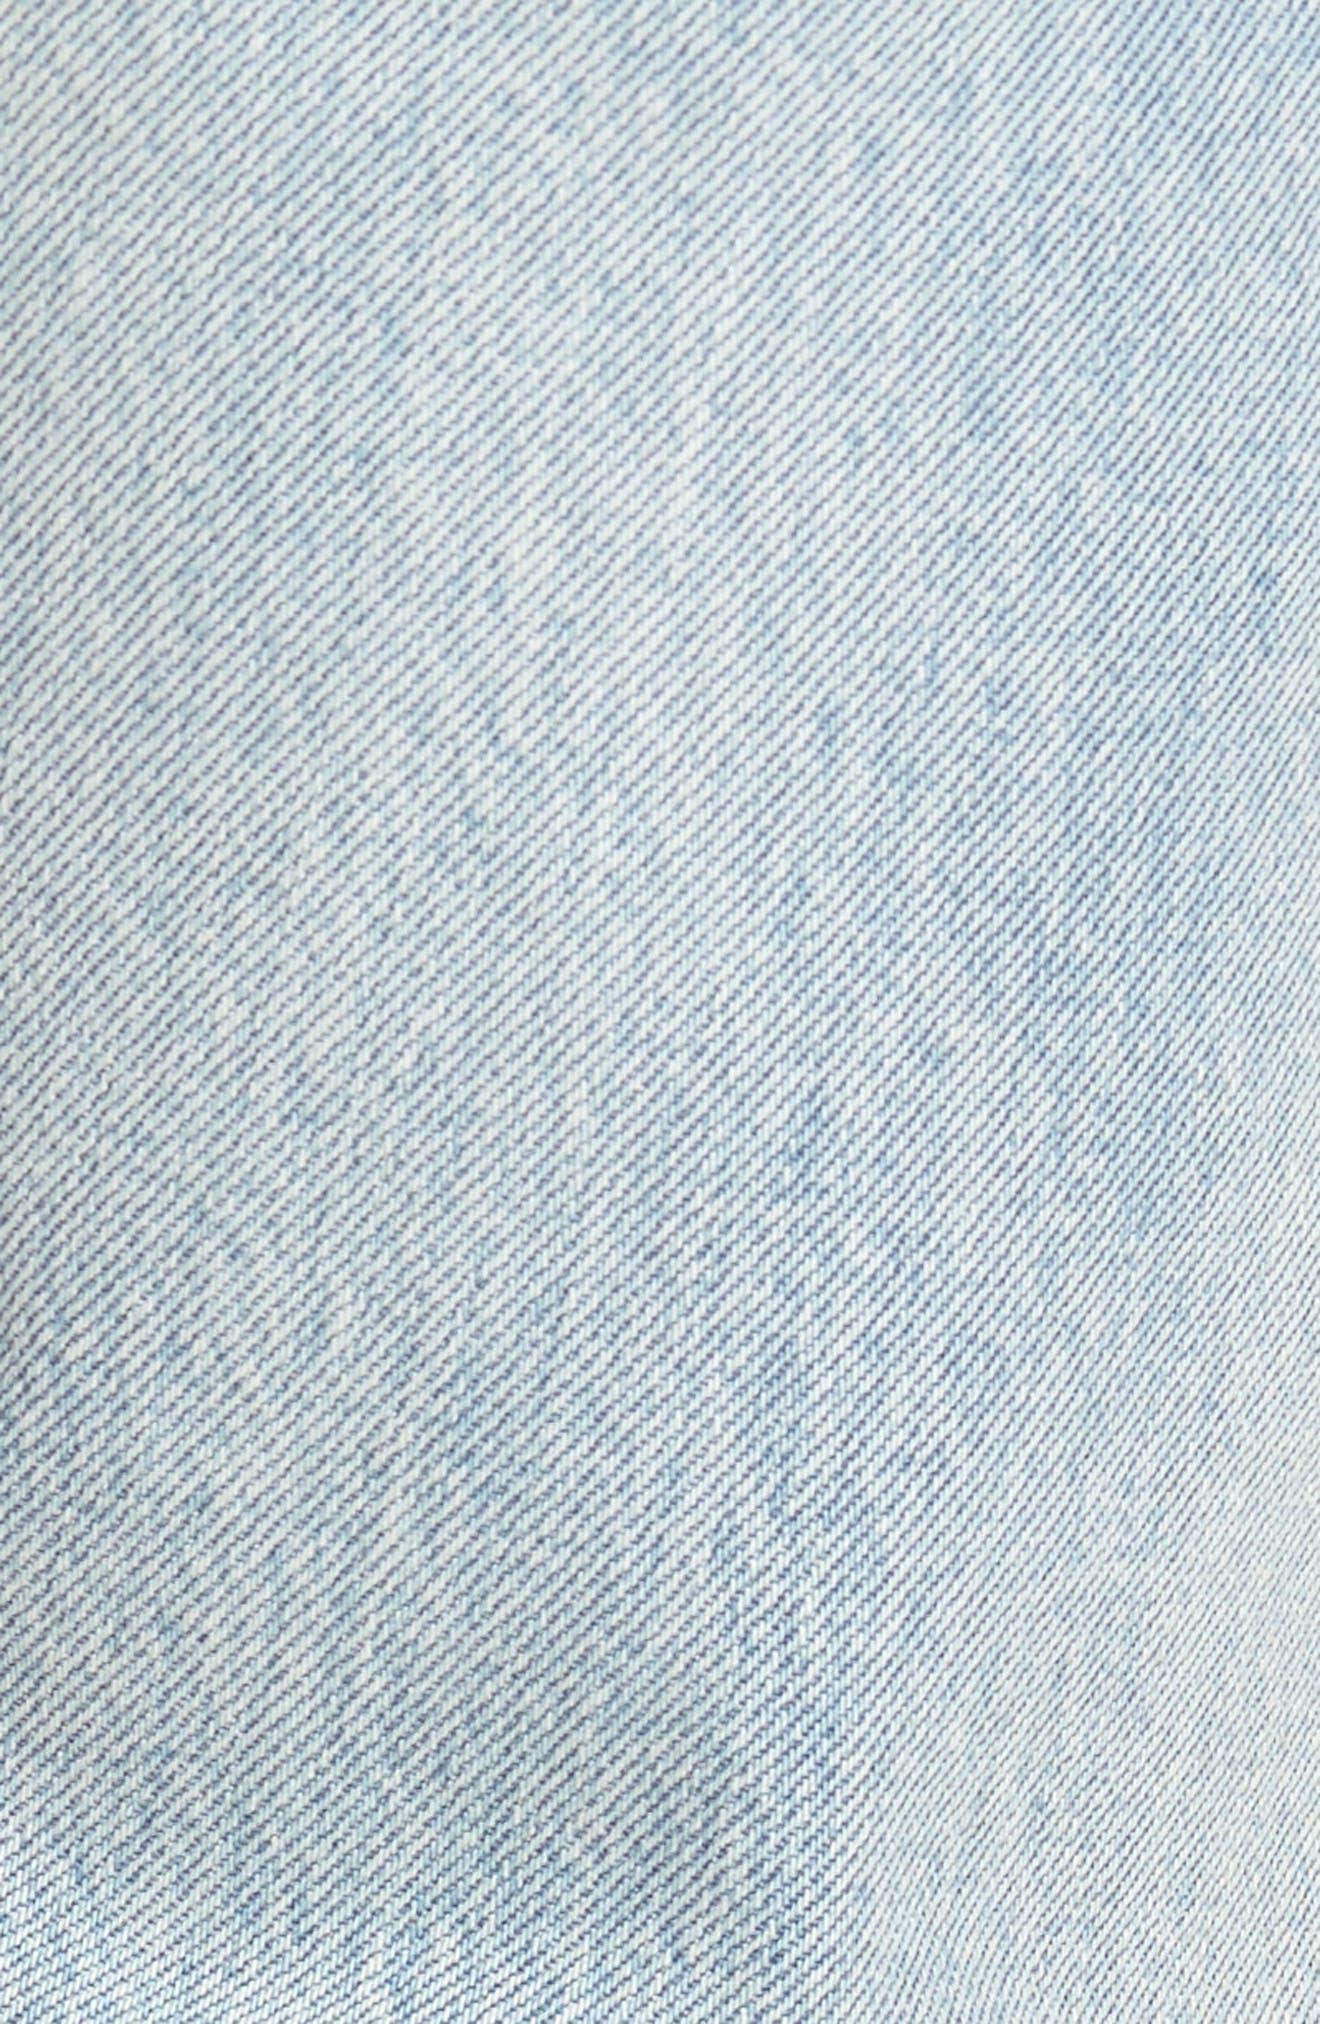 Alternate Image 5  - Levi's® 512™ Skinny Fit Crop Jeans (Medium Blue Surf Ave)